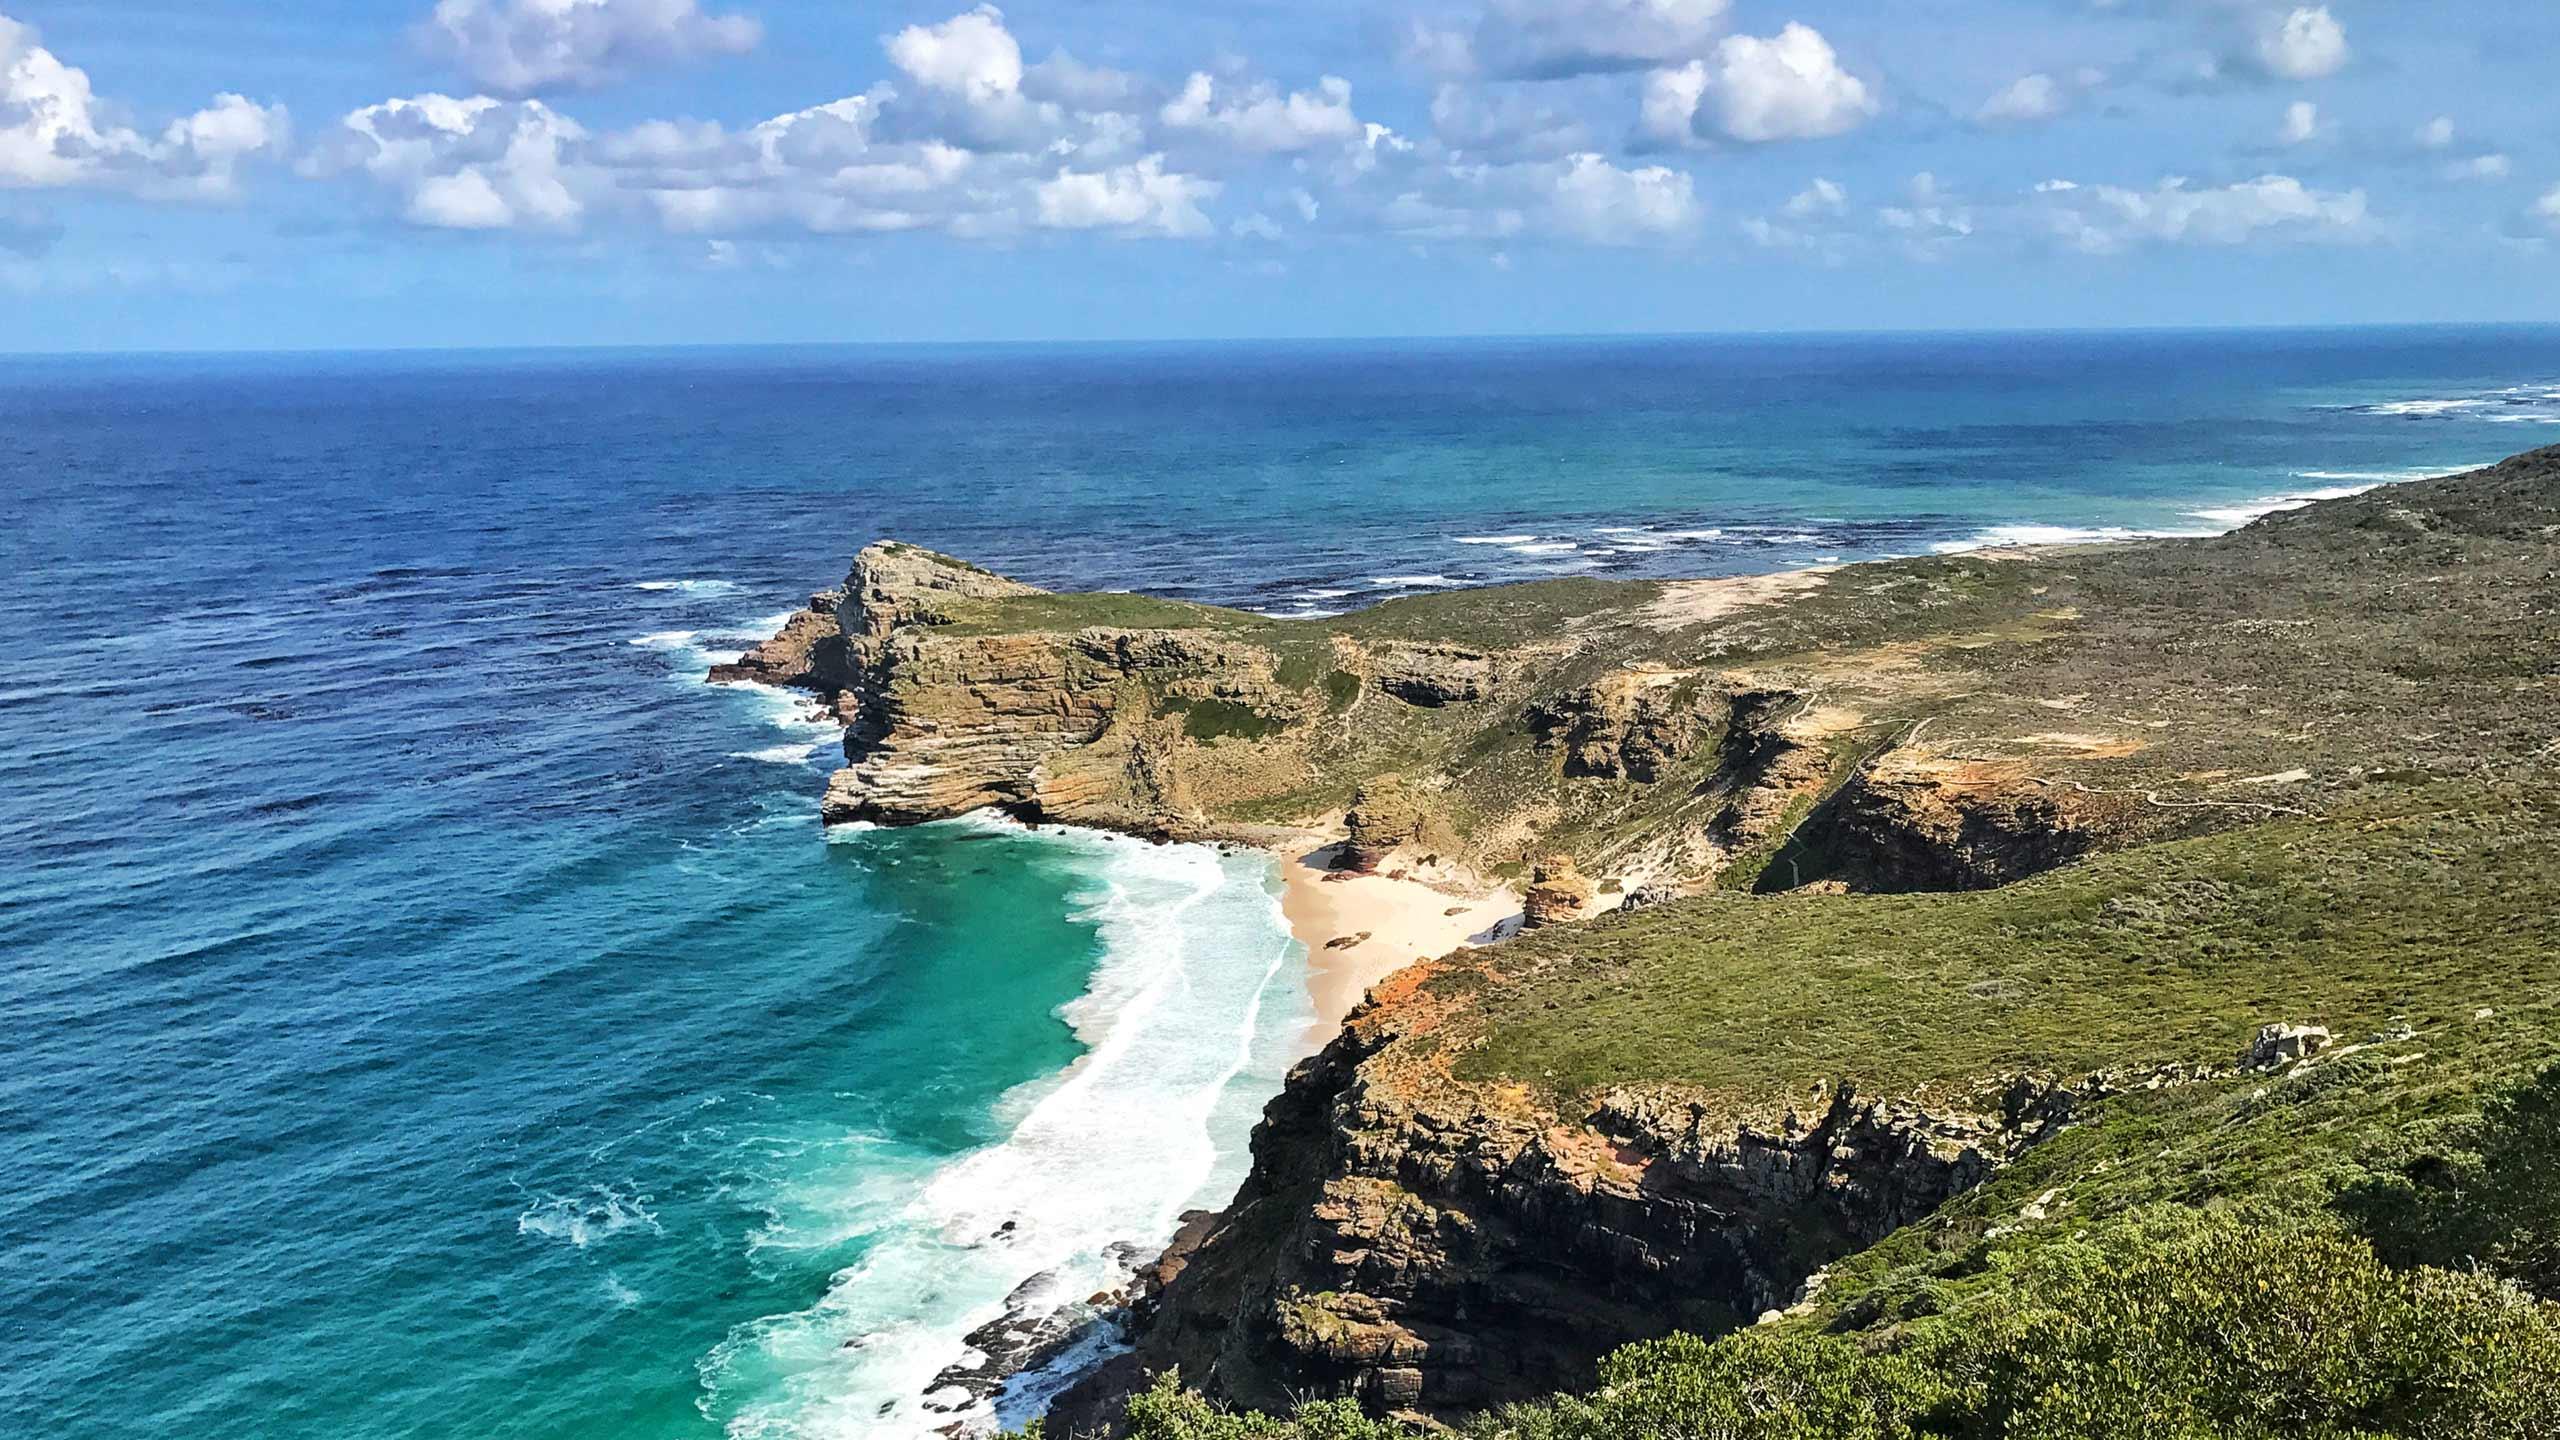 Cape of Good Hope, Cape Peninsula, South Africa